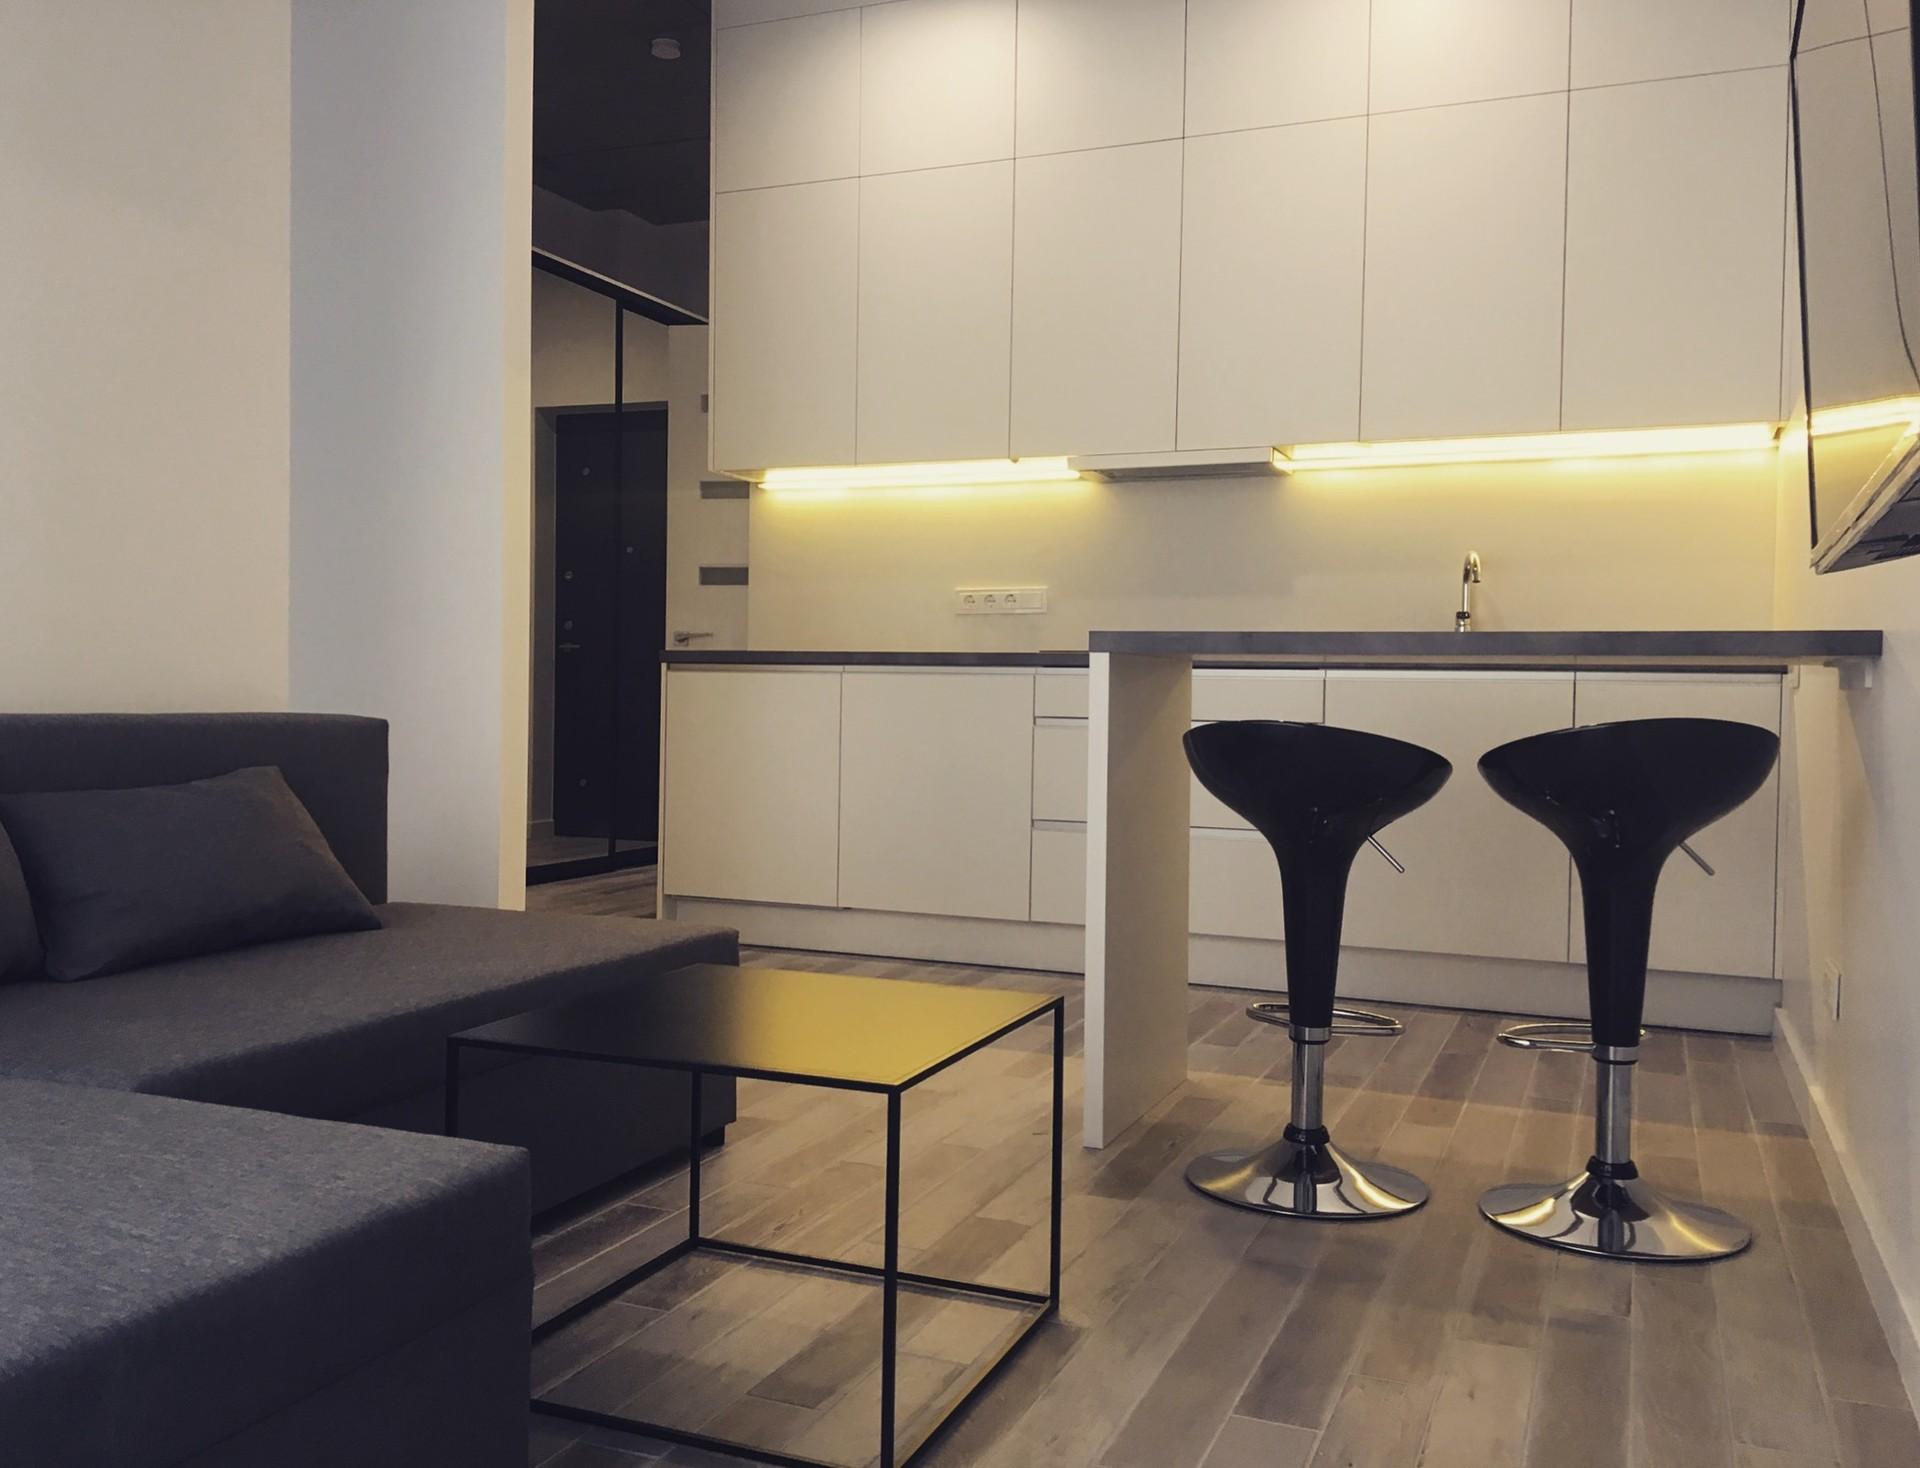 new-brand-apartment-oldtown-da034692d2cacd7fb03c65332f3013b2